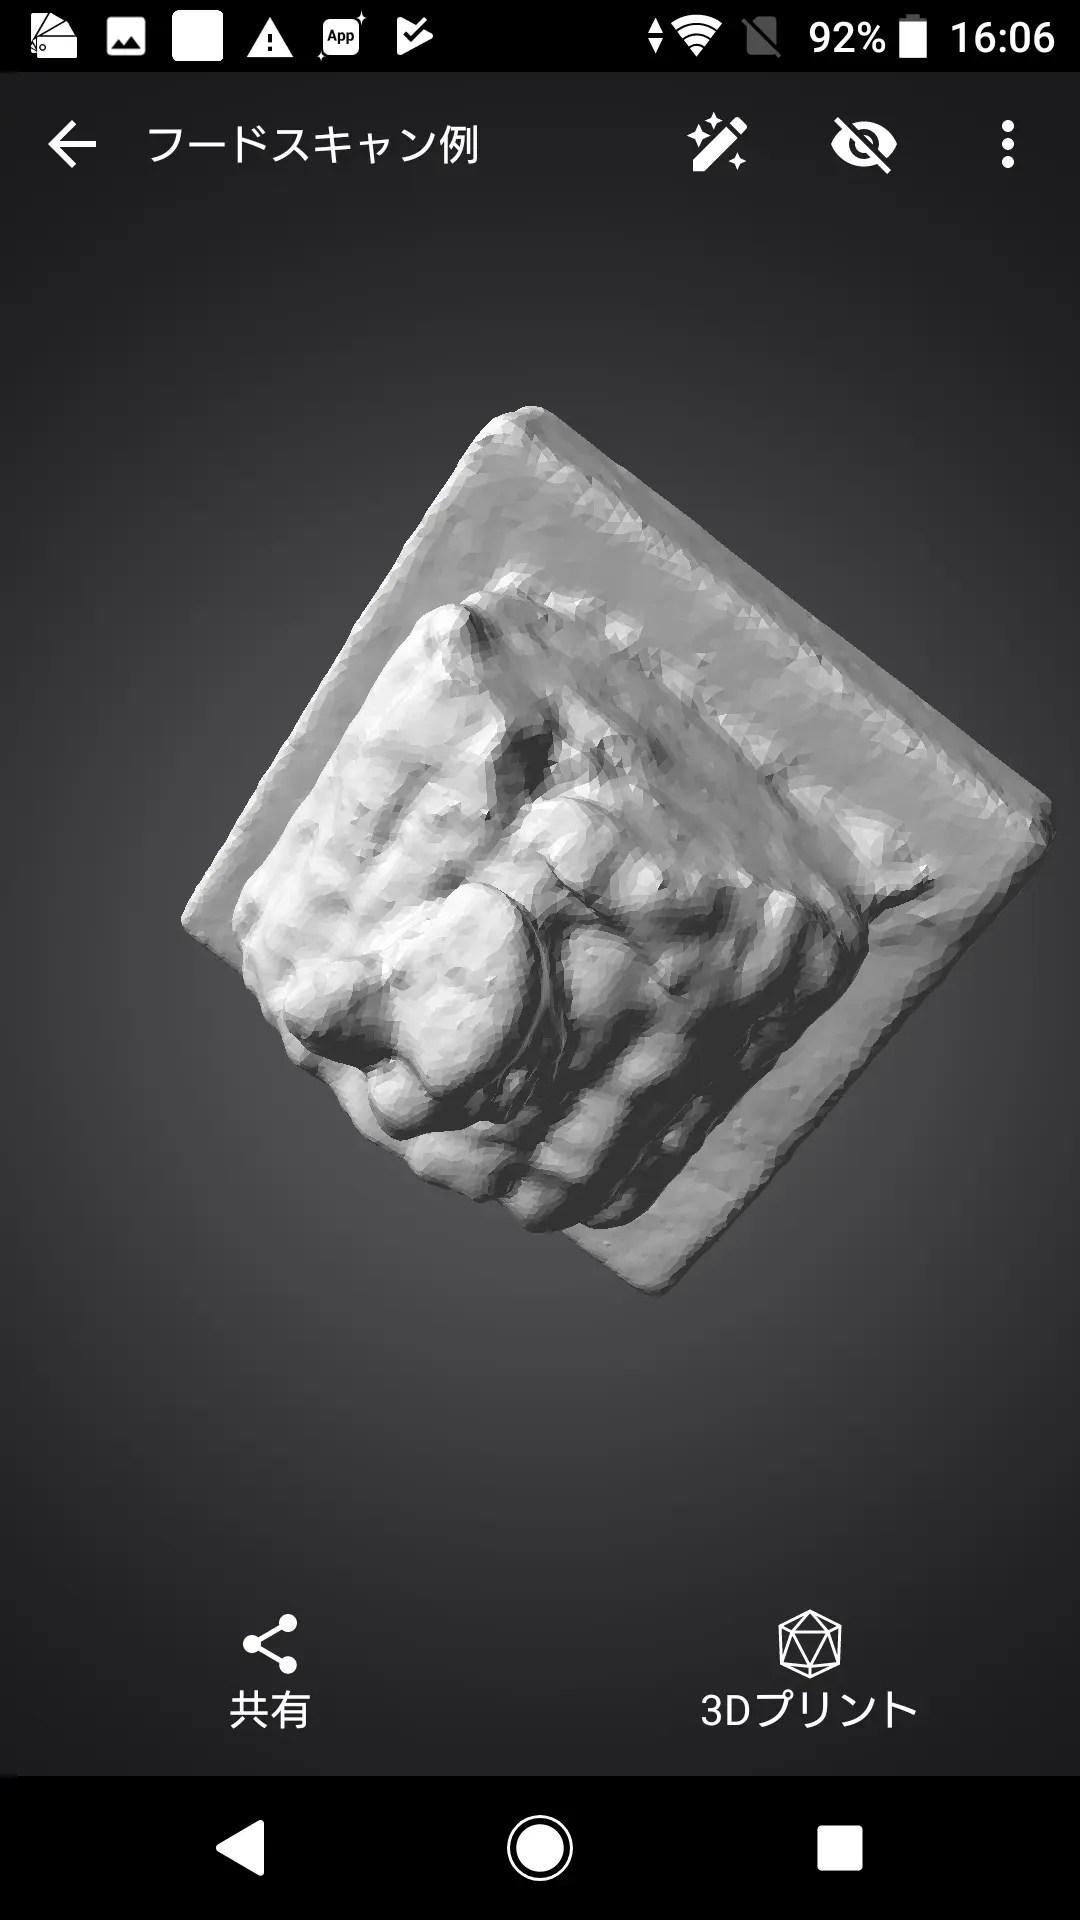 Sony Xperia XZ1 3Dクリエーター 3Dプリント 自由造形スキャン ケーキ モーフィング